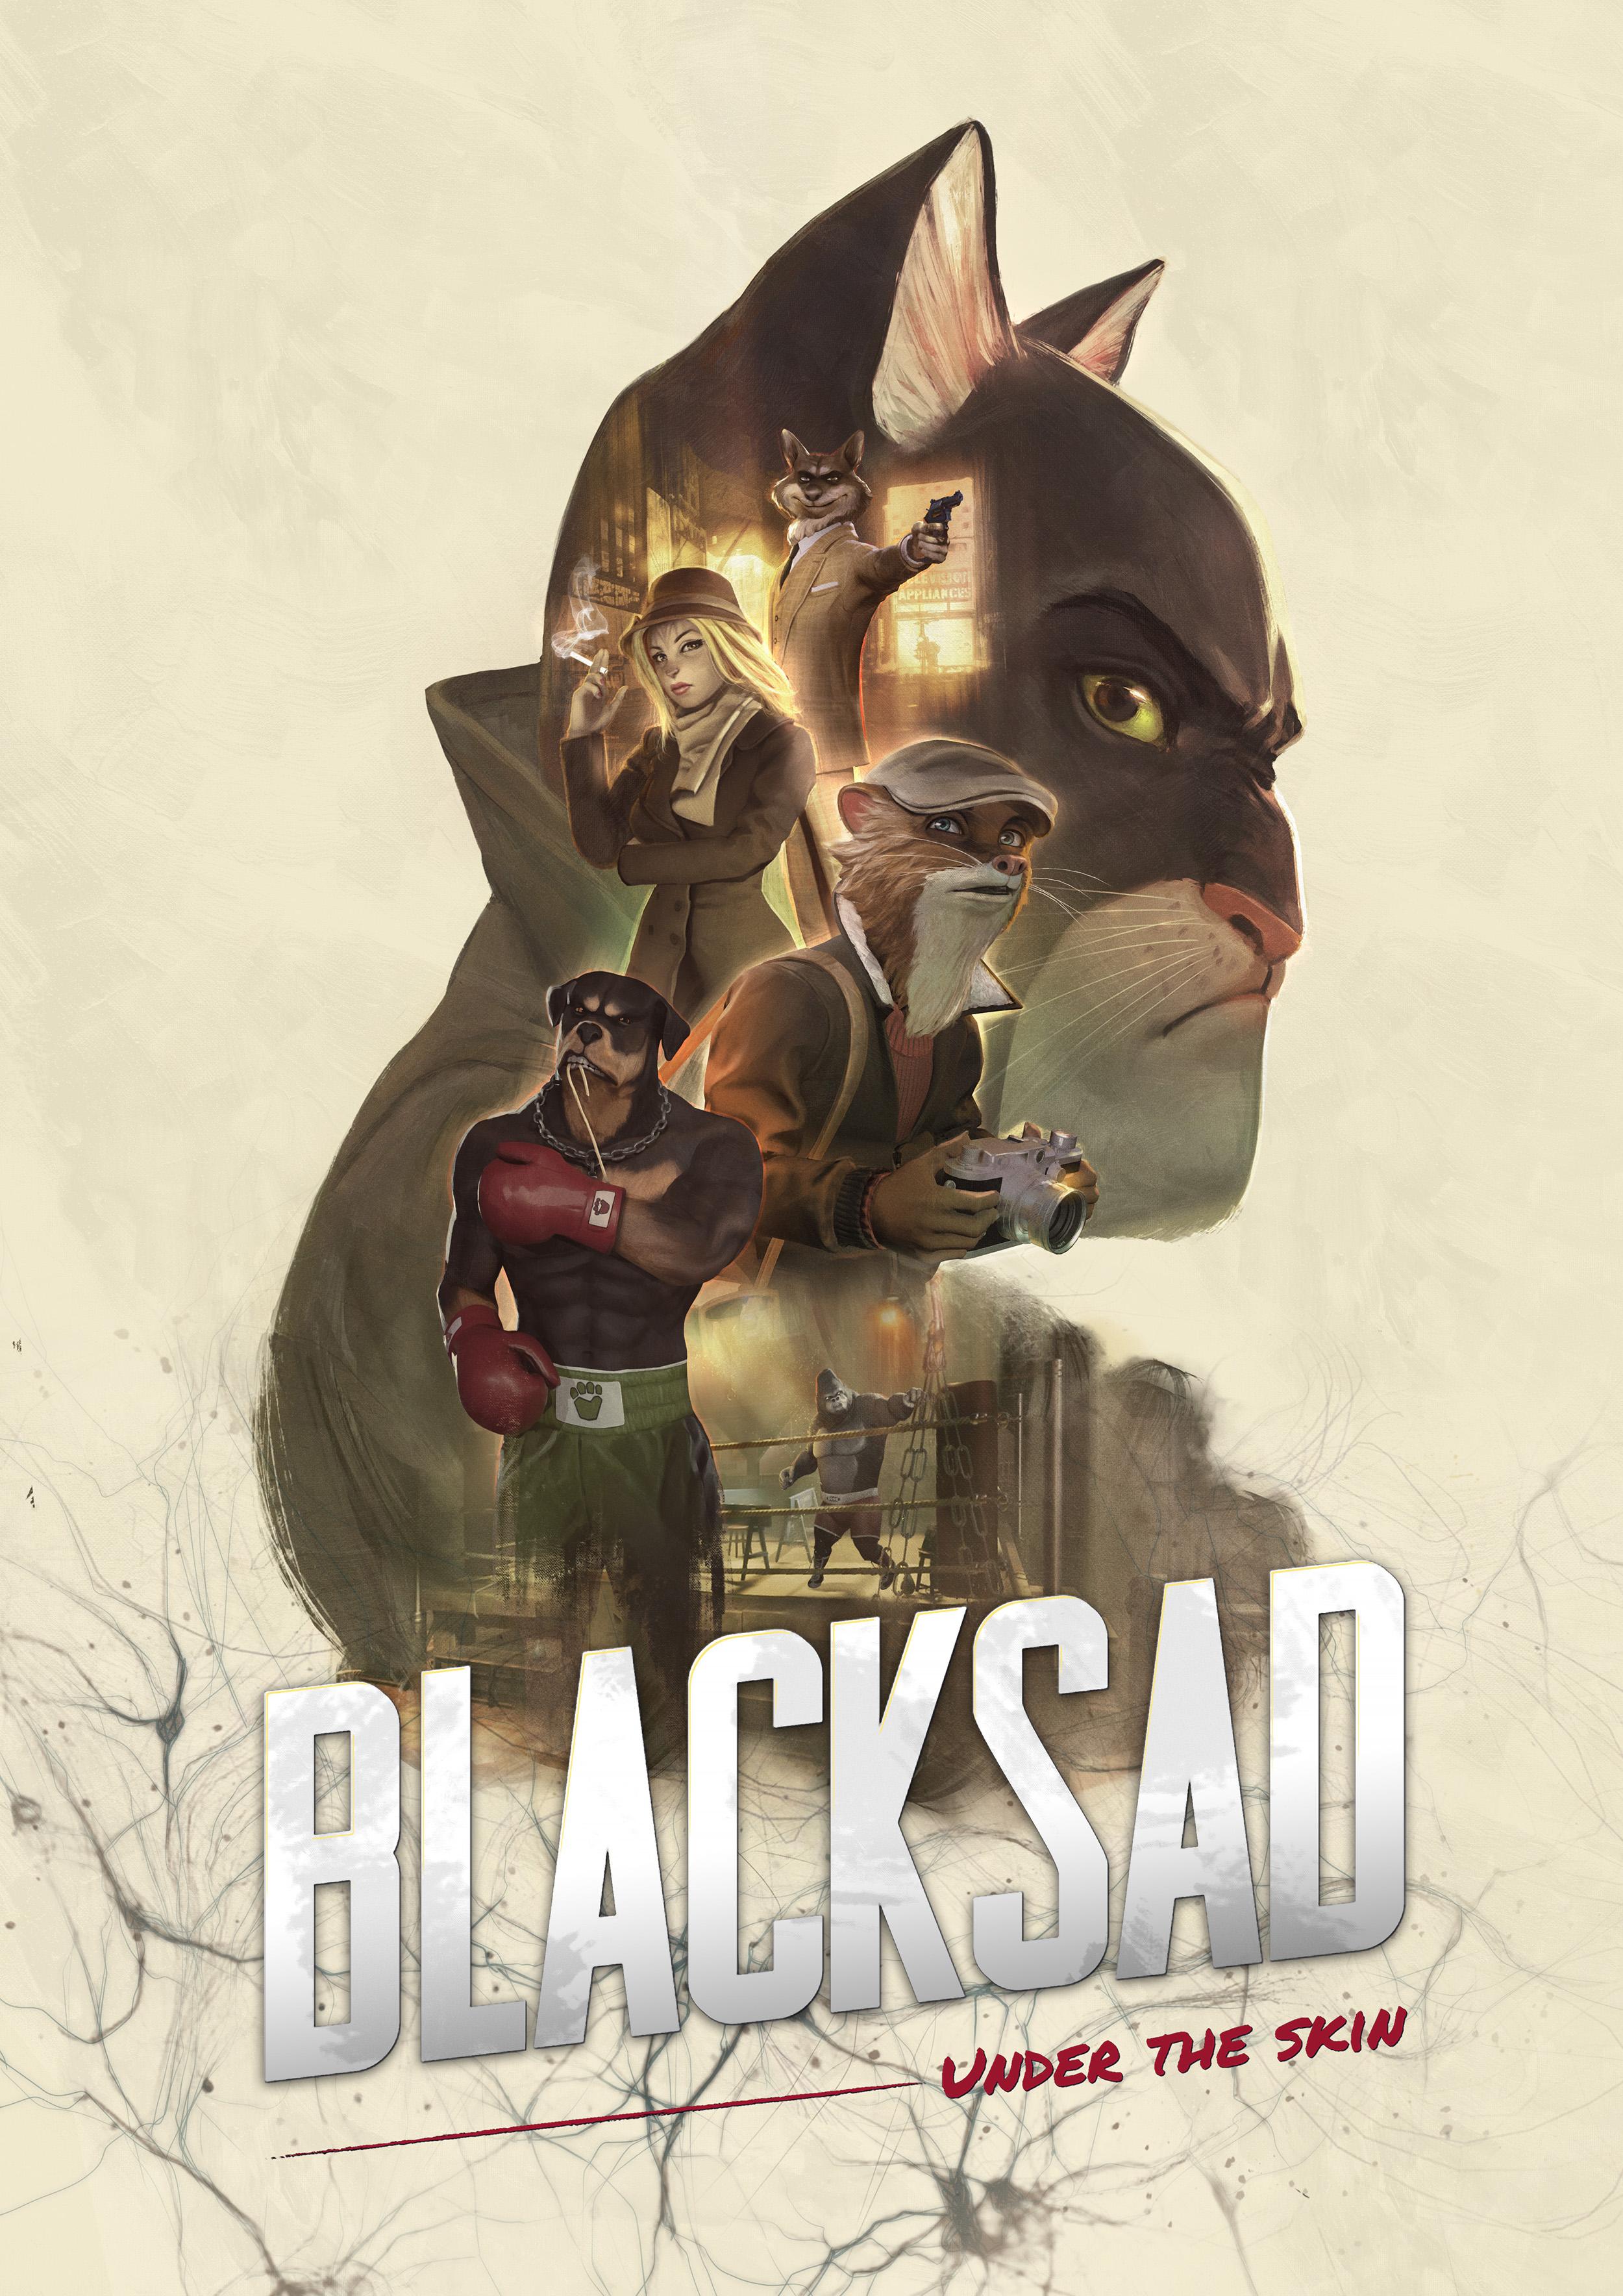 Blacksad UnderThe Skin Key Art 2